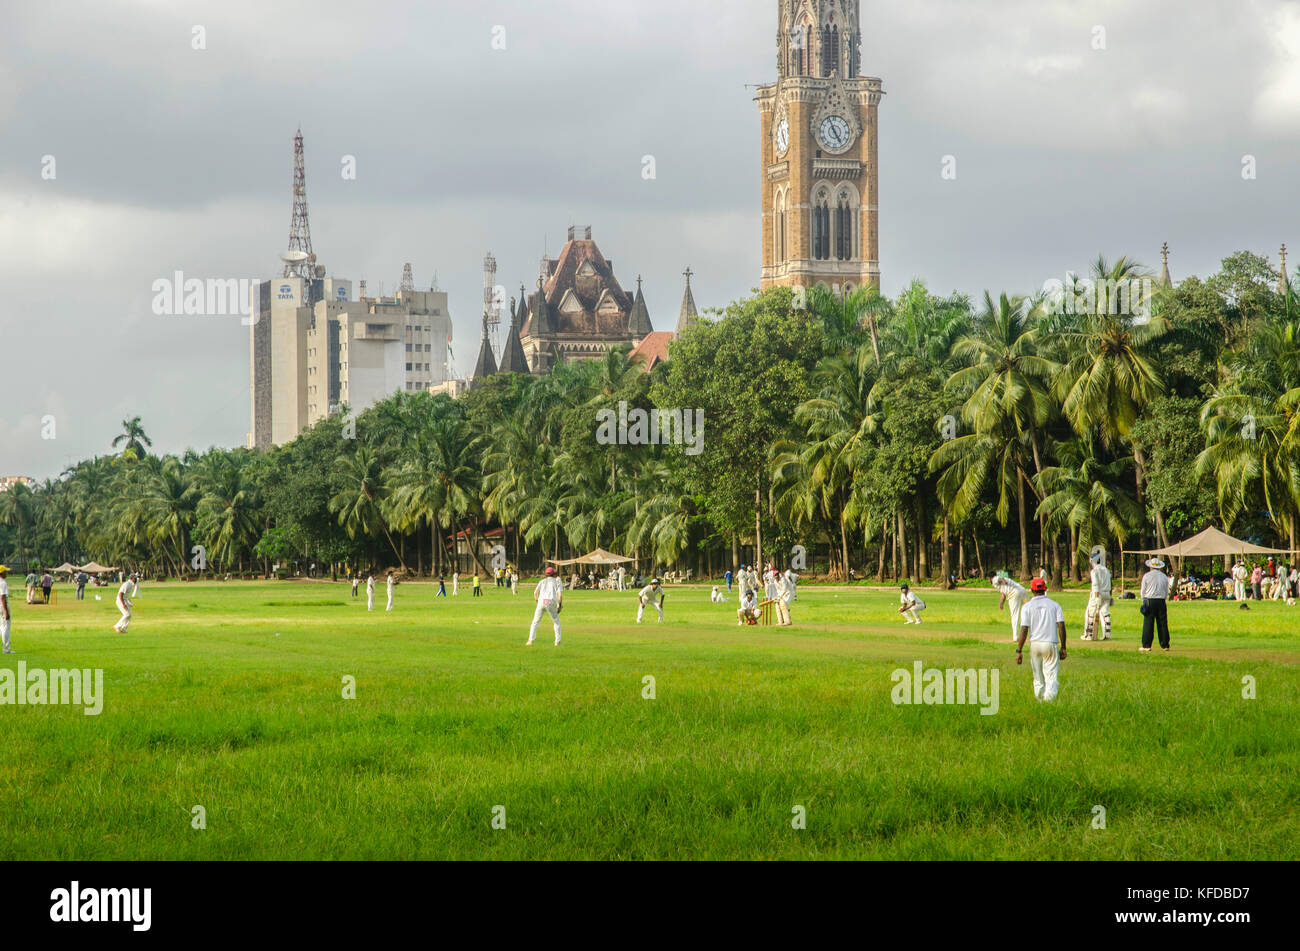 People playing cricket in Mumbai, India - Stock Image